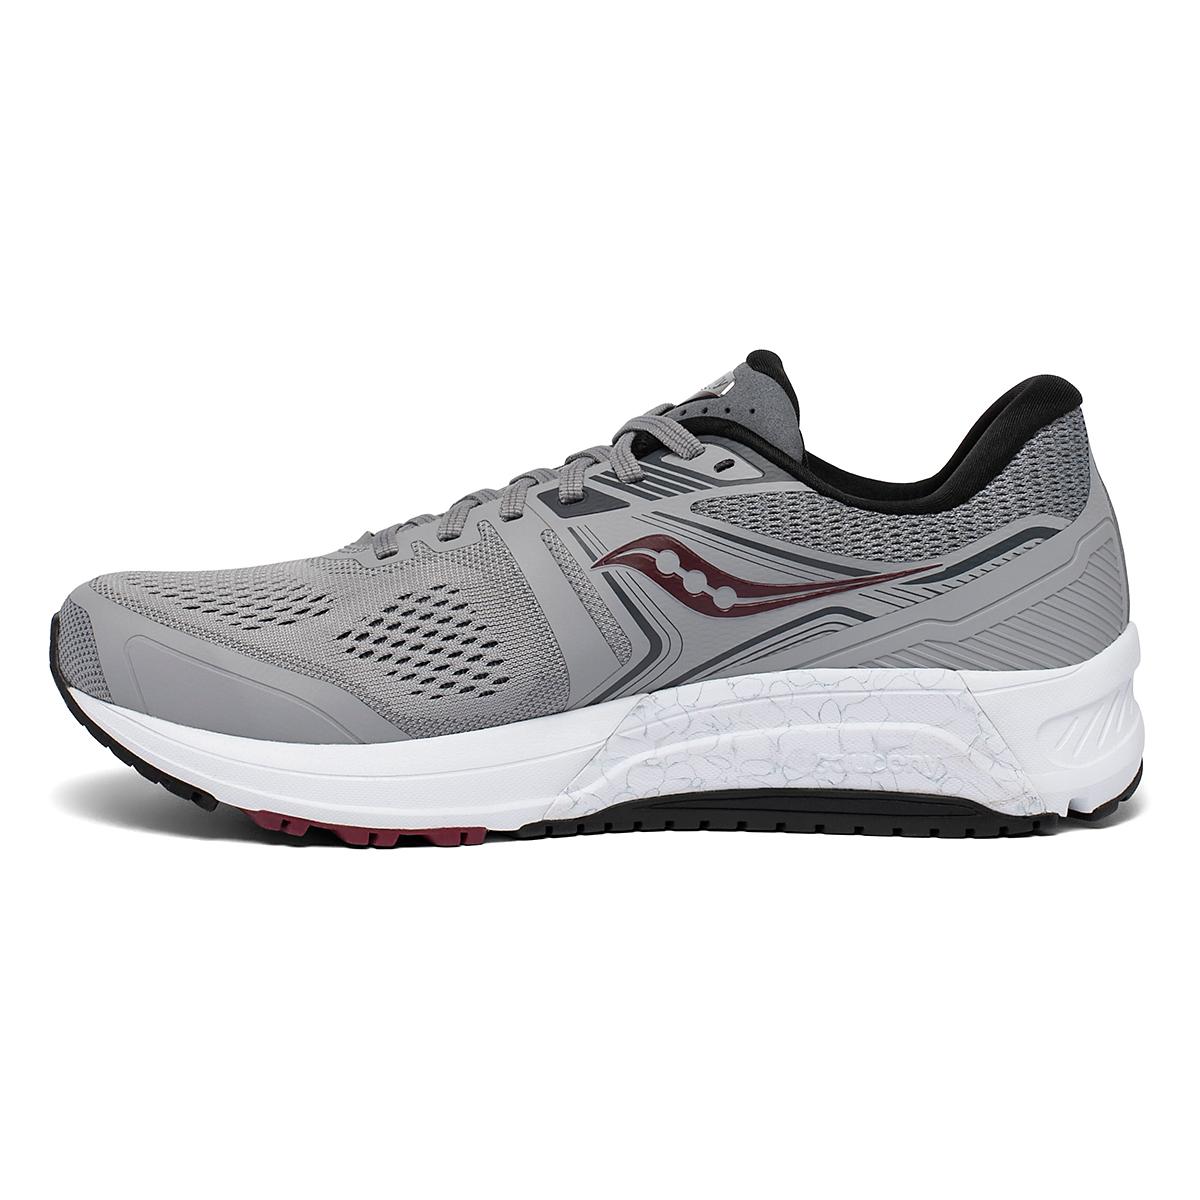 Men's Saucony Omni 19 Walking Shoe - Color: Alloy/Brick - Size: 7 - Width: Wide, Alloy/Brick, large, image 2